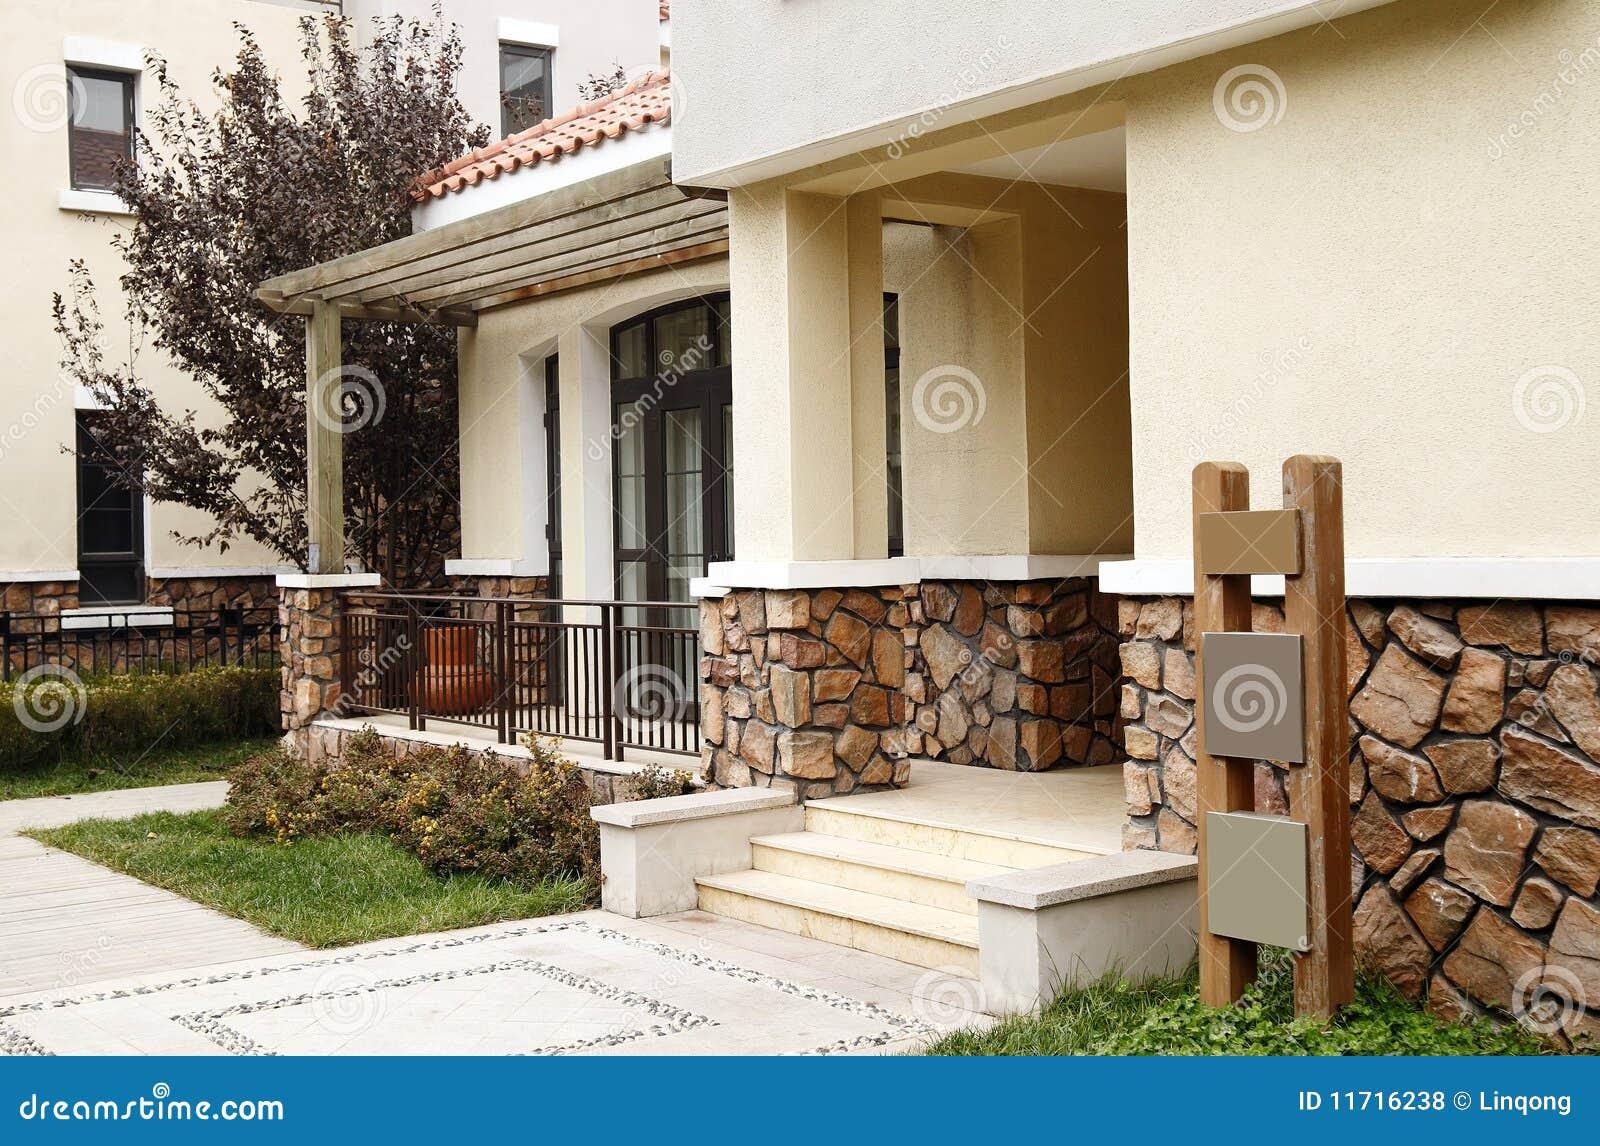 Porte moderne de villa photos libres de droits image for Des villas modernes